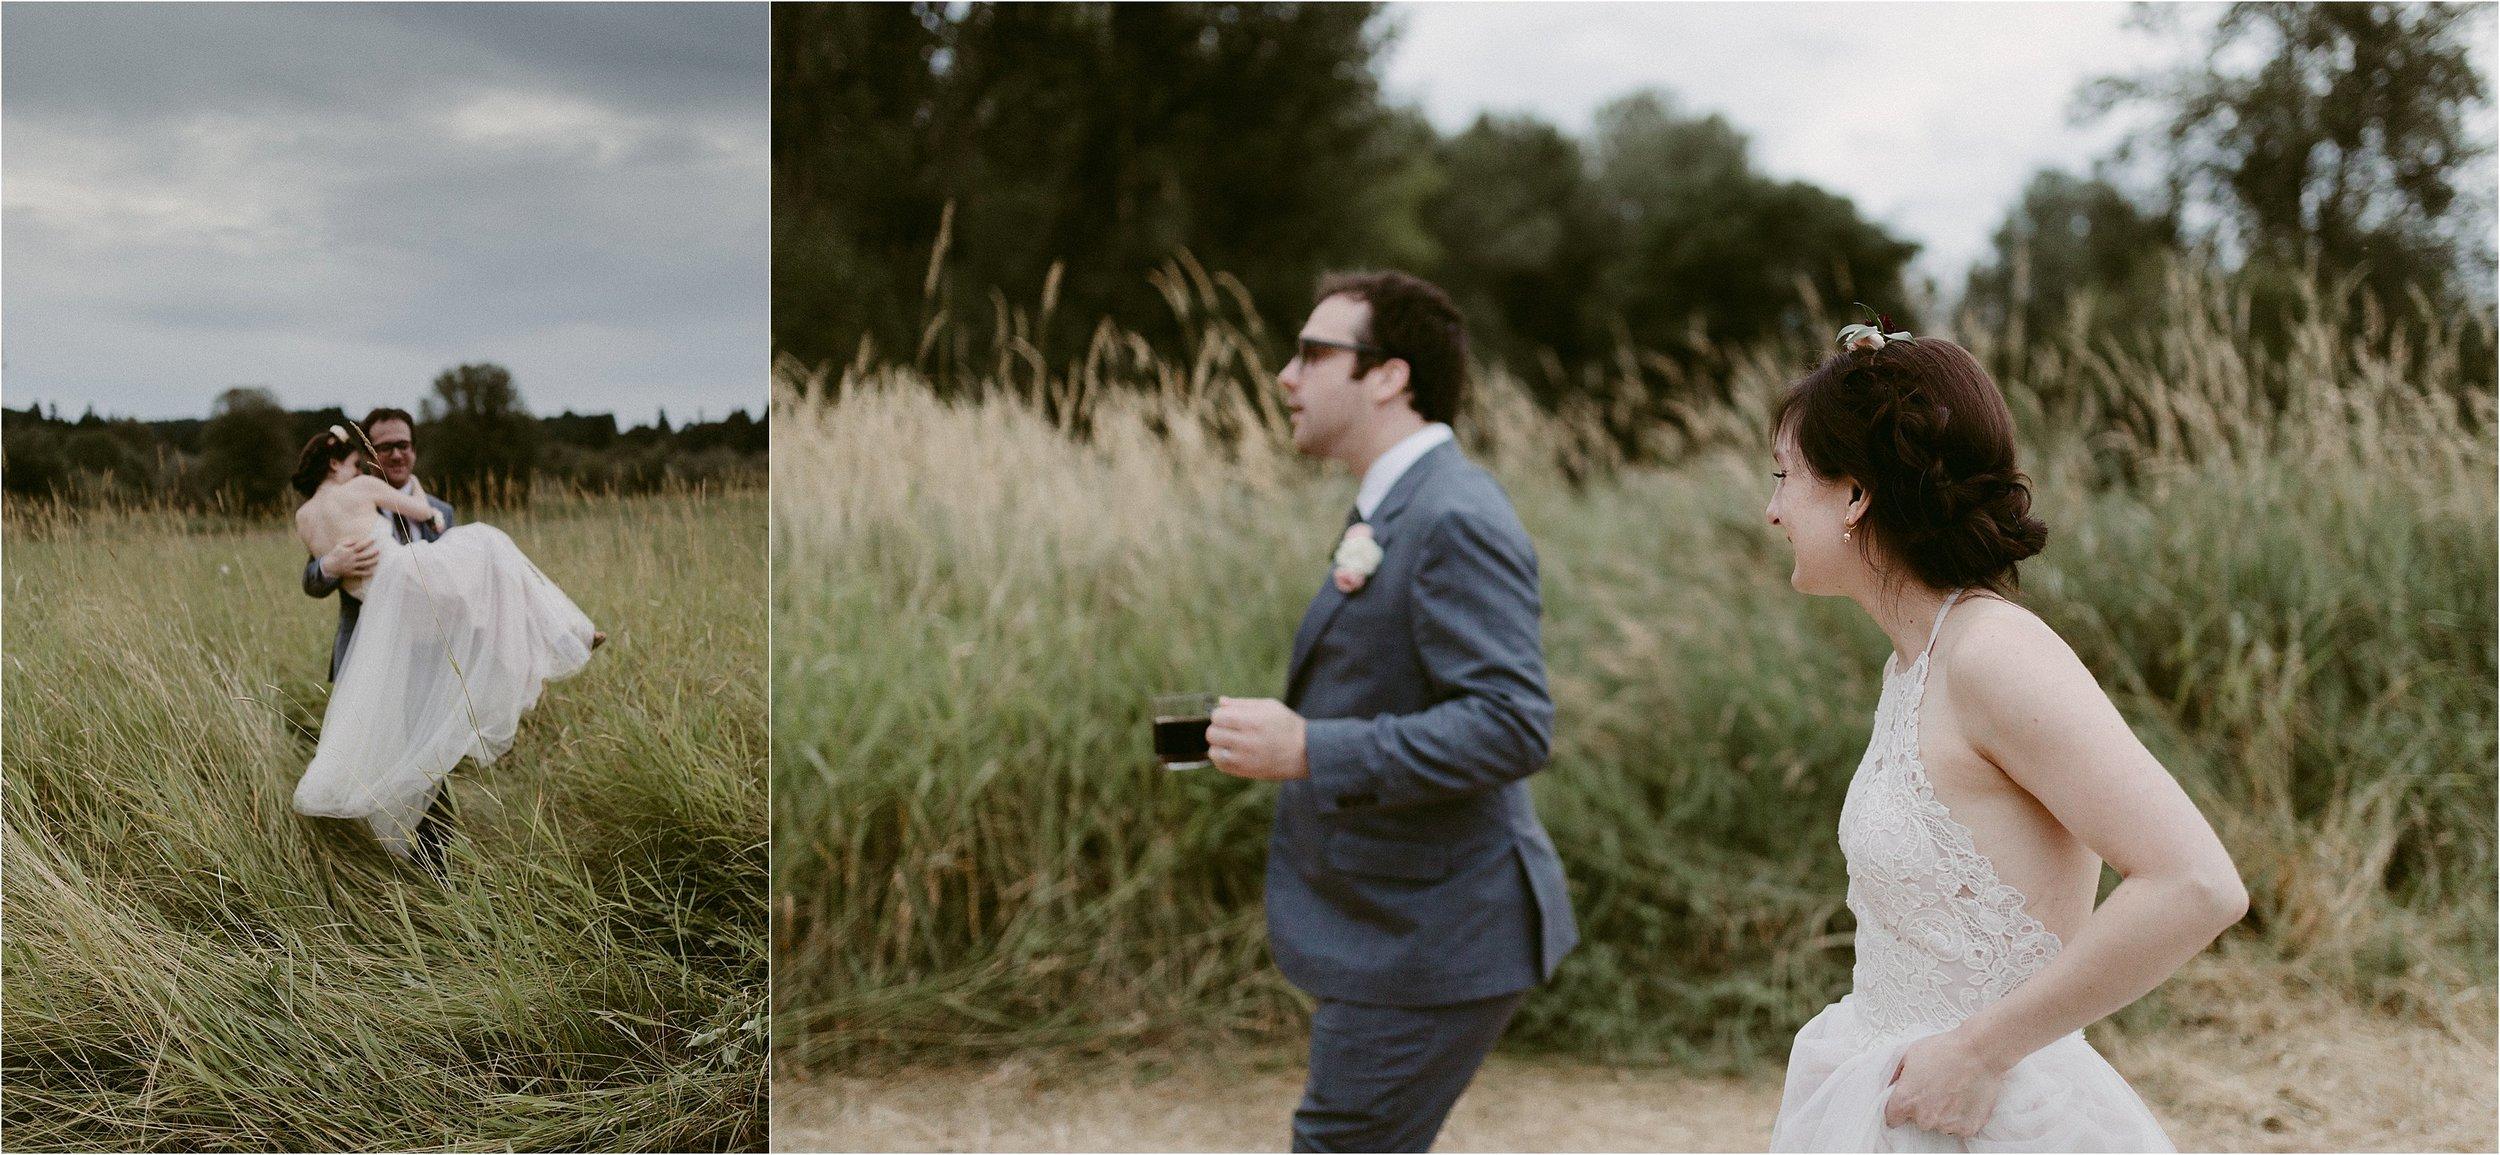 boho-hipster-indie-wedding-portland-wedding-photographer_0405.jpg